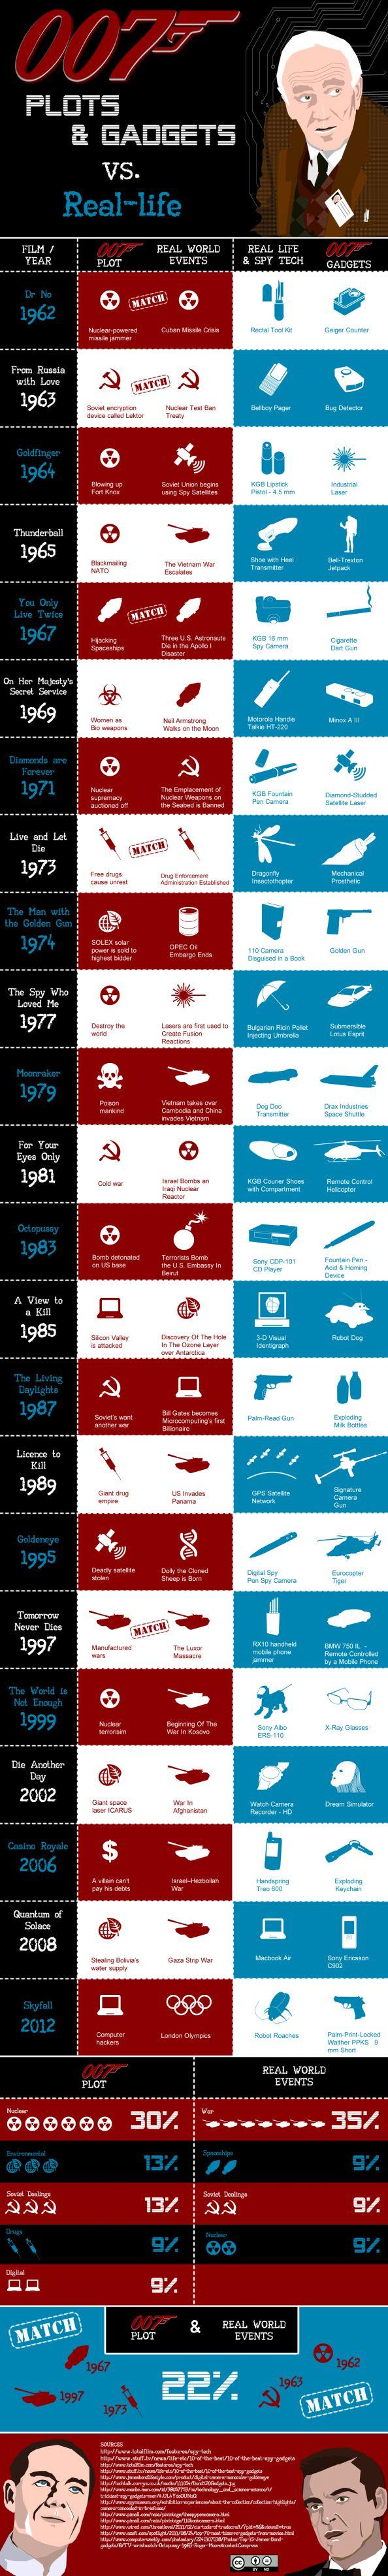 James Bond...007's Plots & Gadgets vs. Real-Life infographic